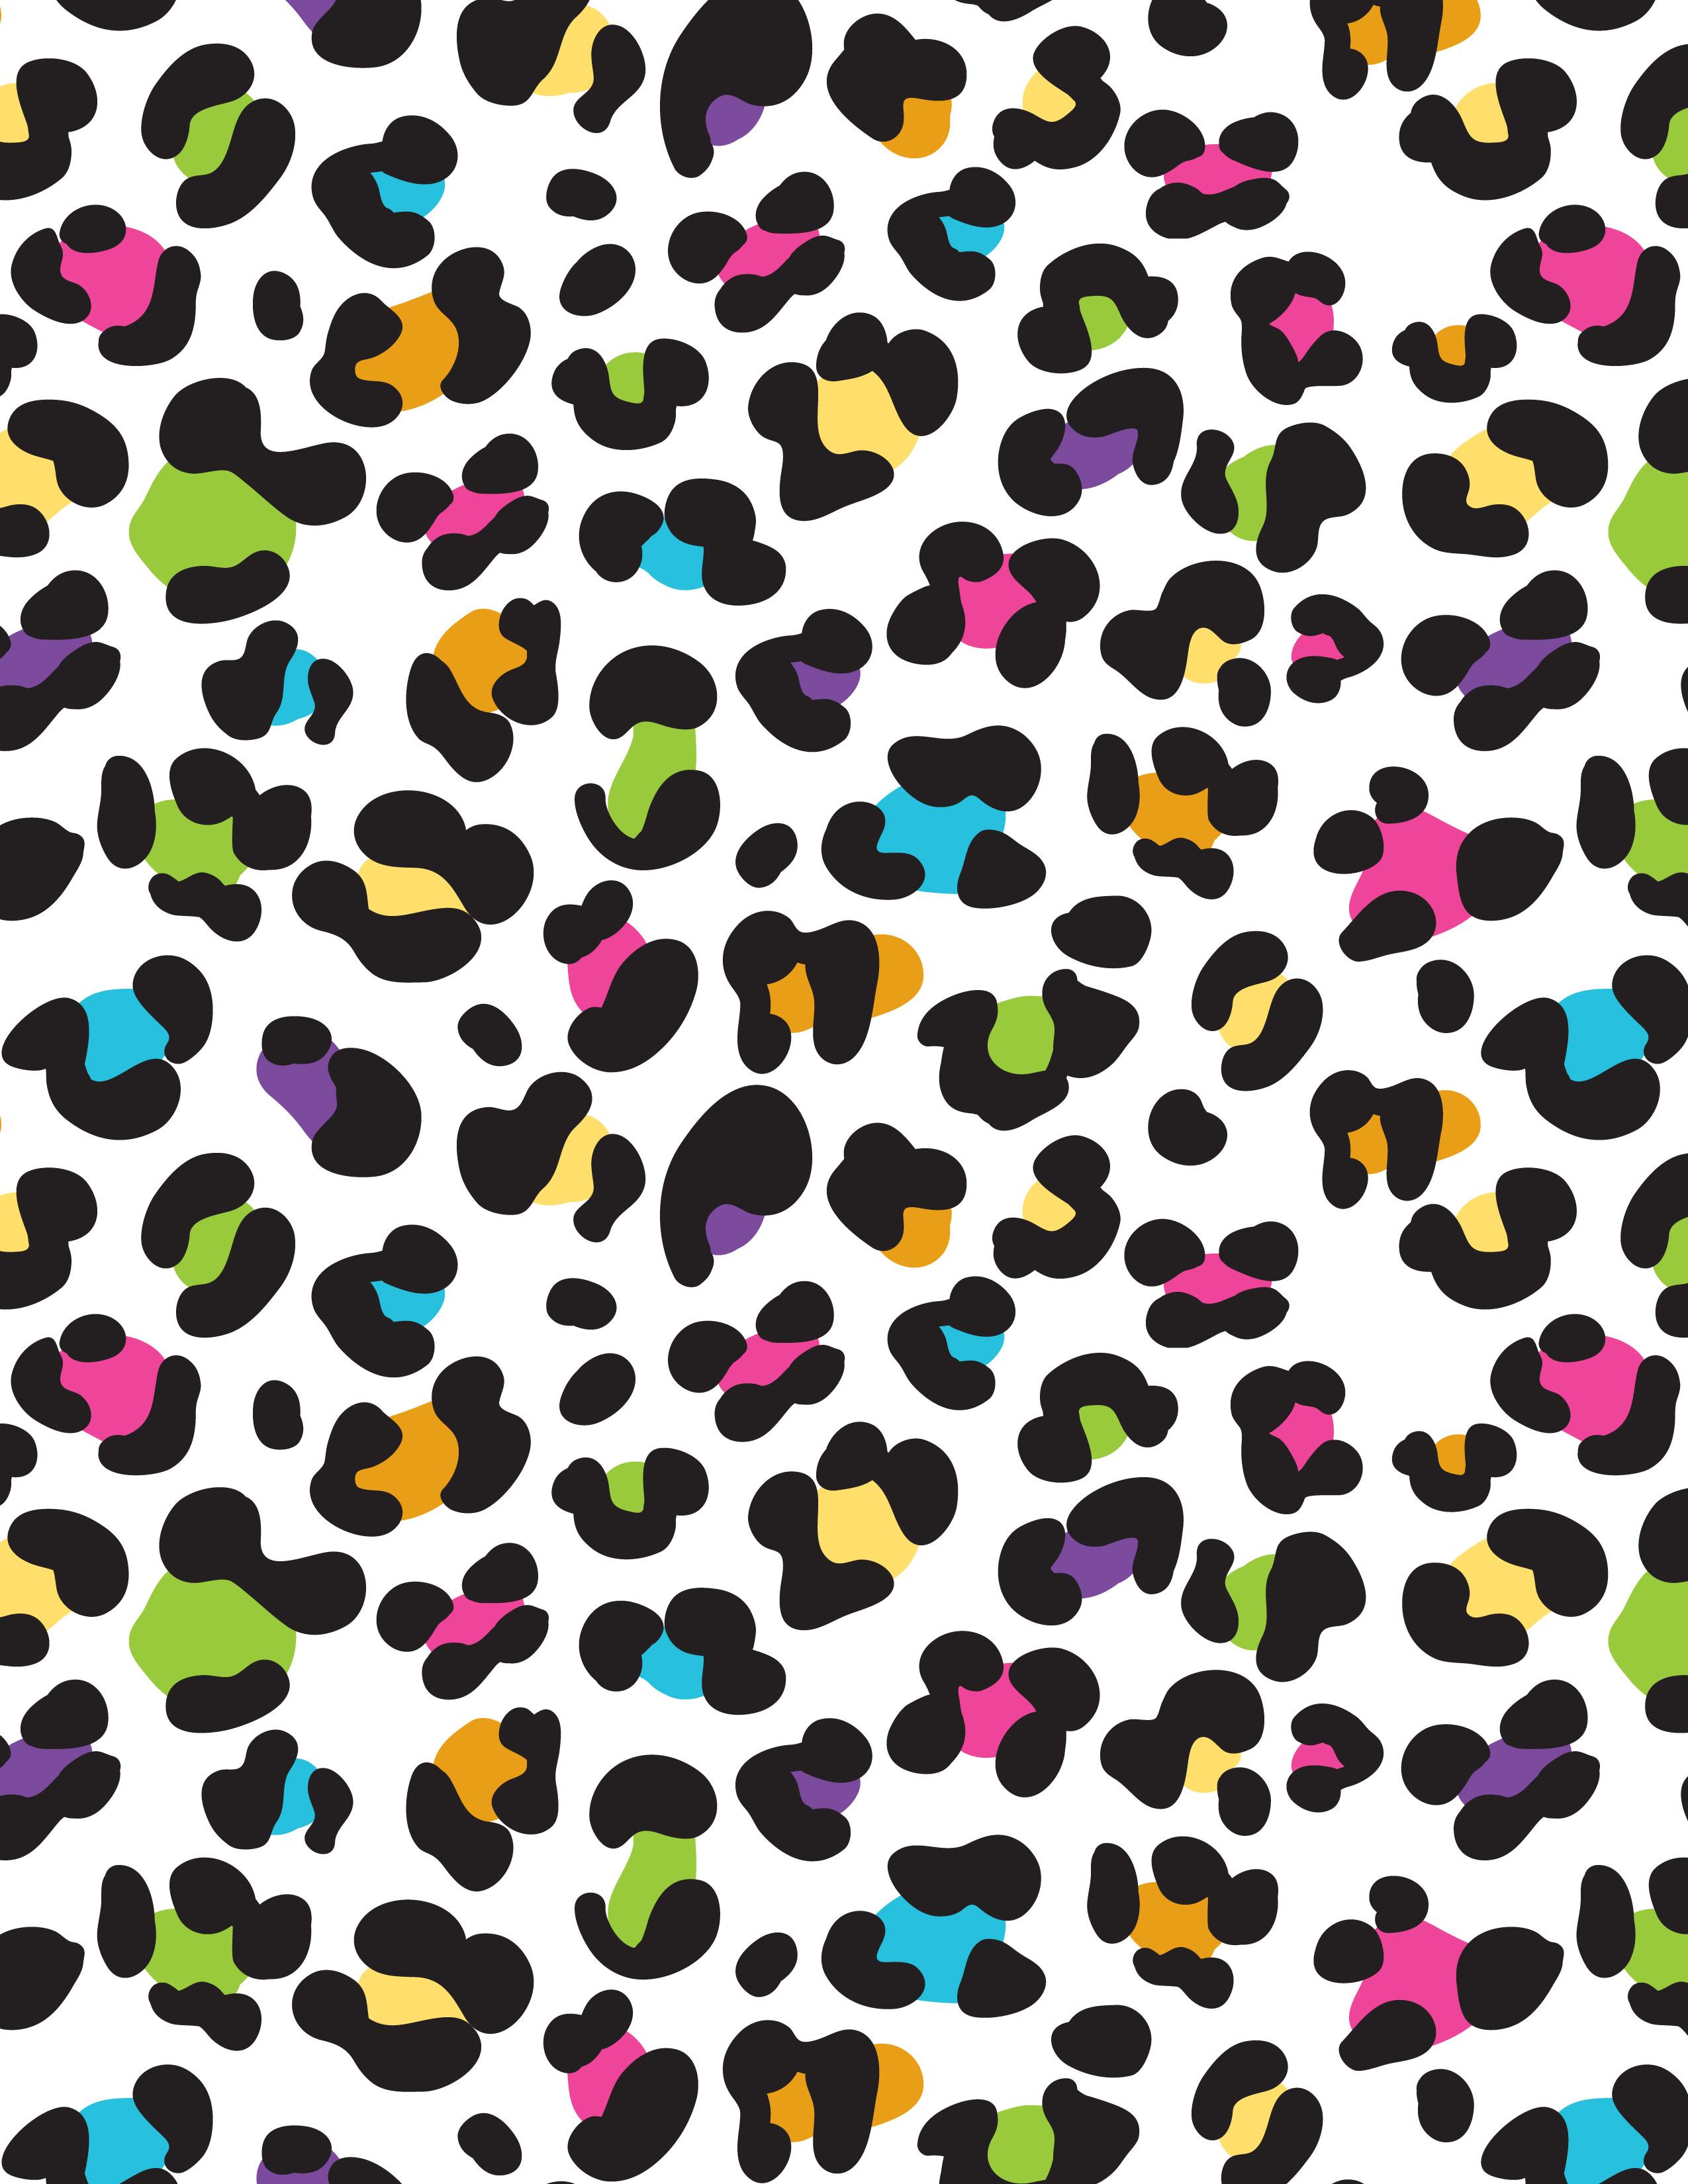 colorful rainbow lisa frank leopard cheetah background 2550x3300